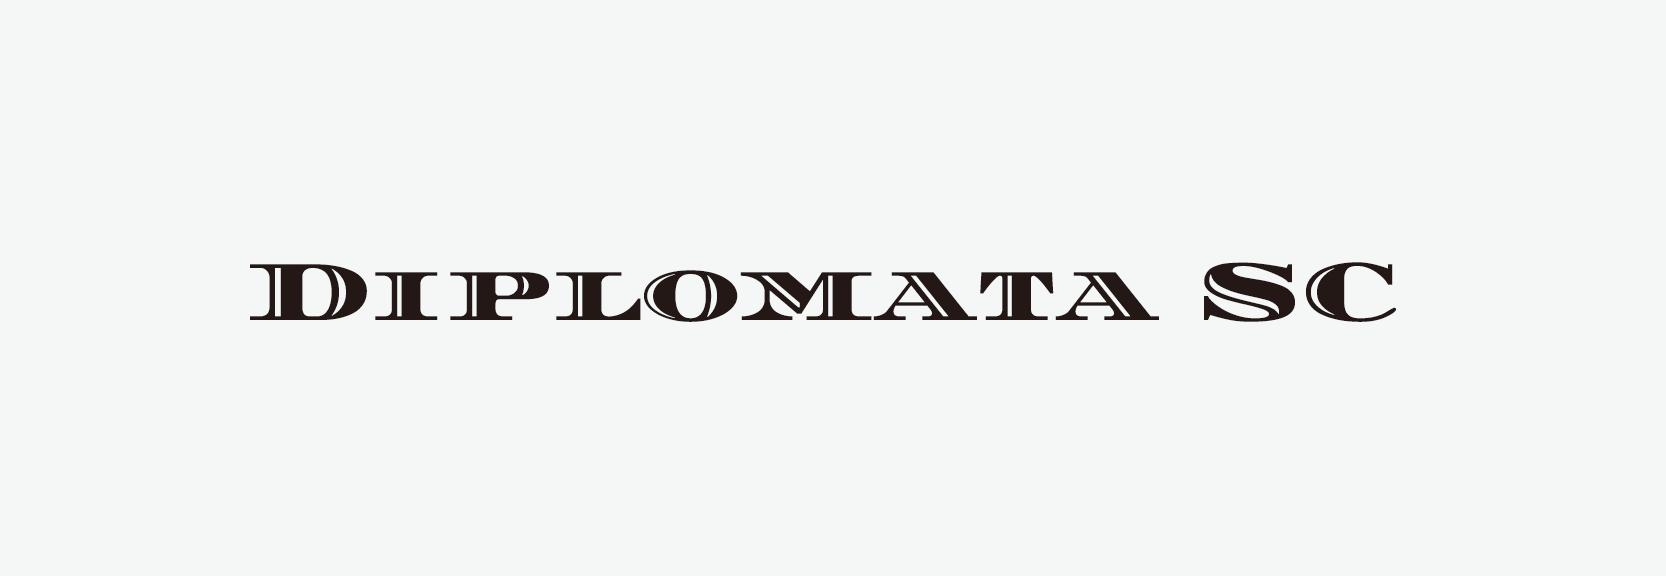 diplomata SC